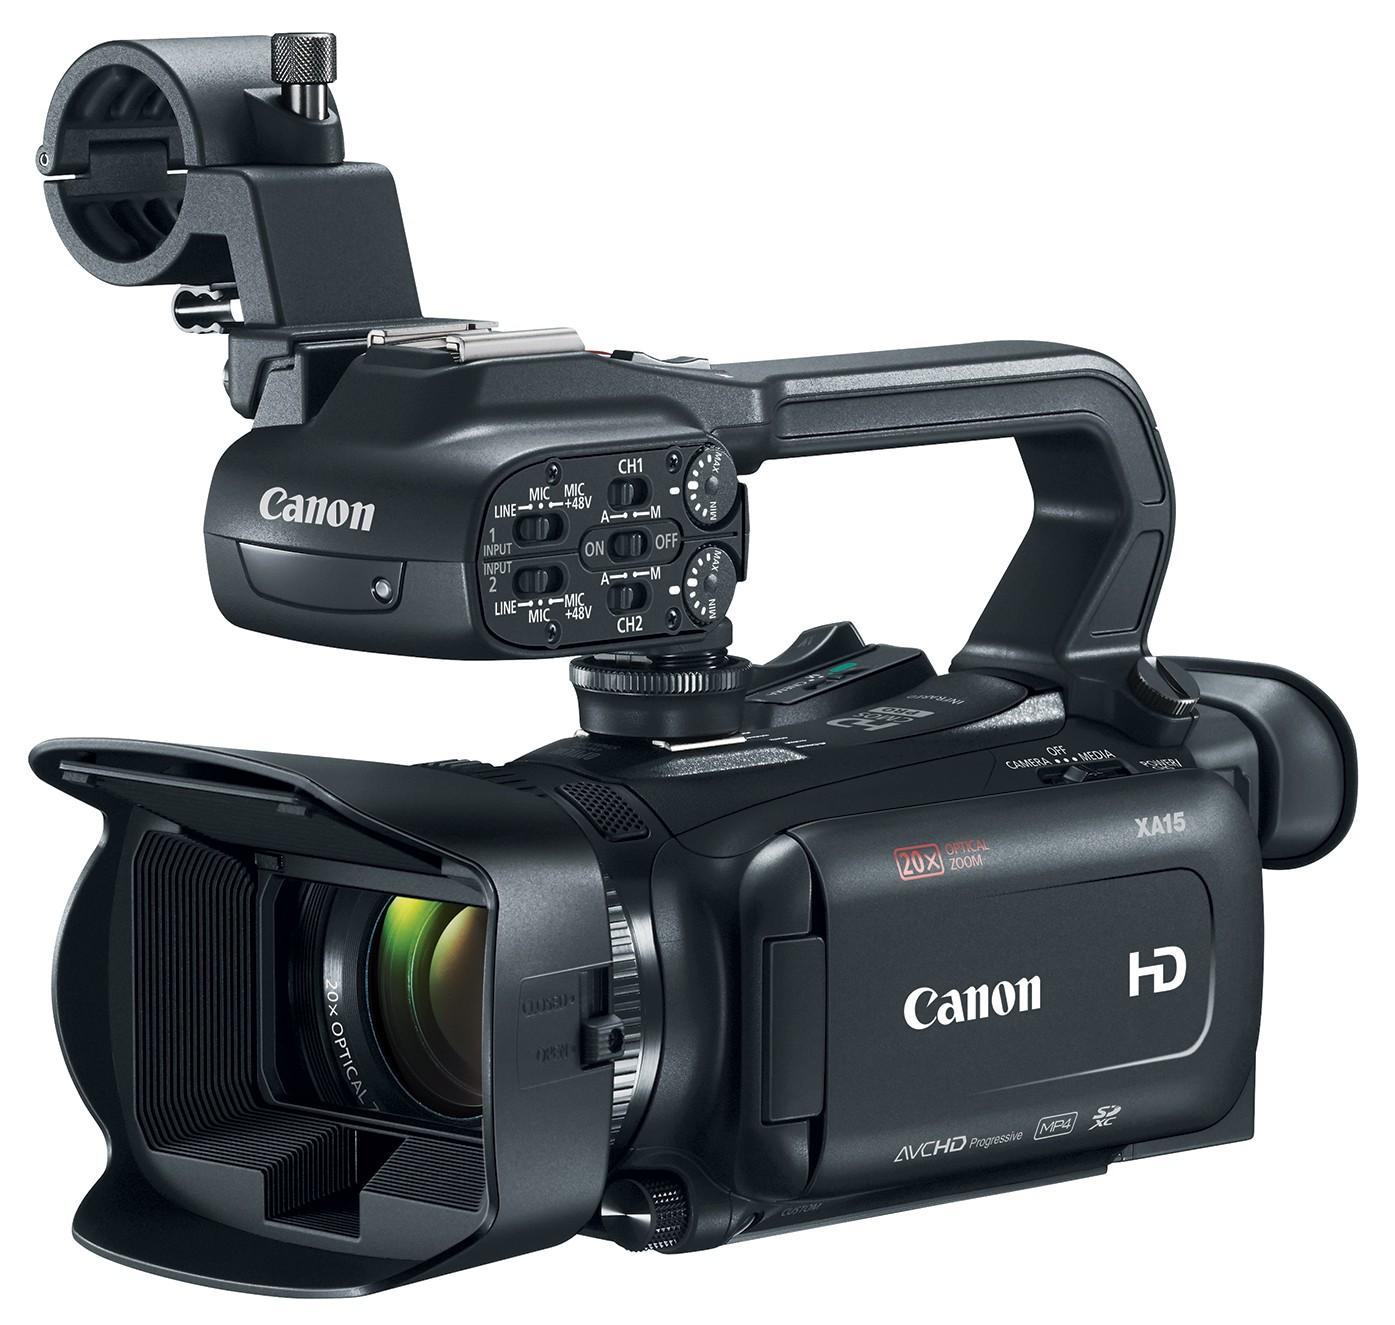 Canon VIXIA HF R700 Camcorder with 32x Optical Zoom, 3